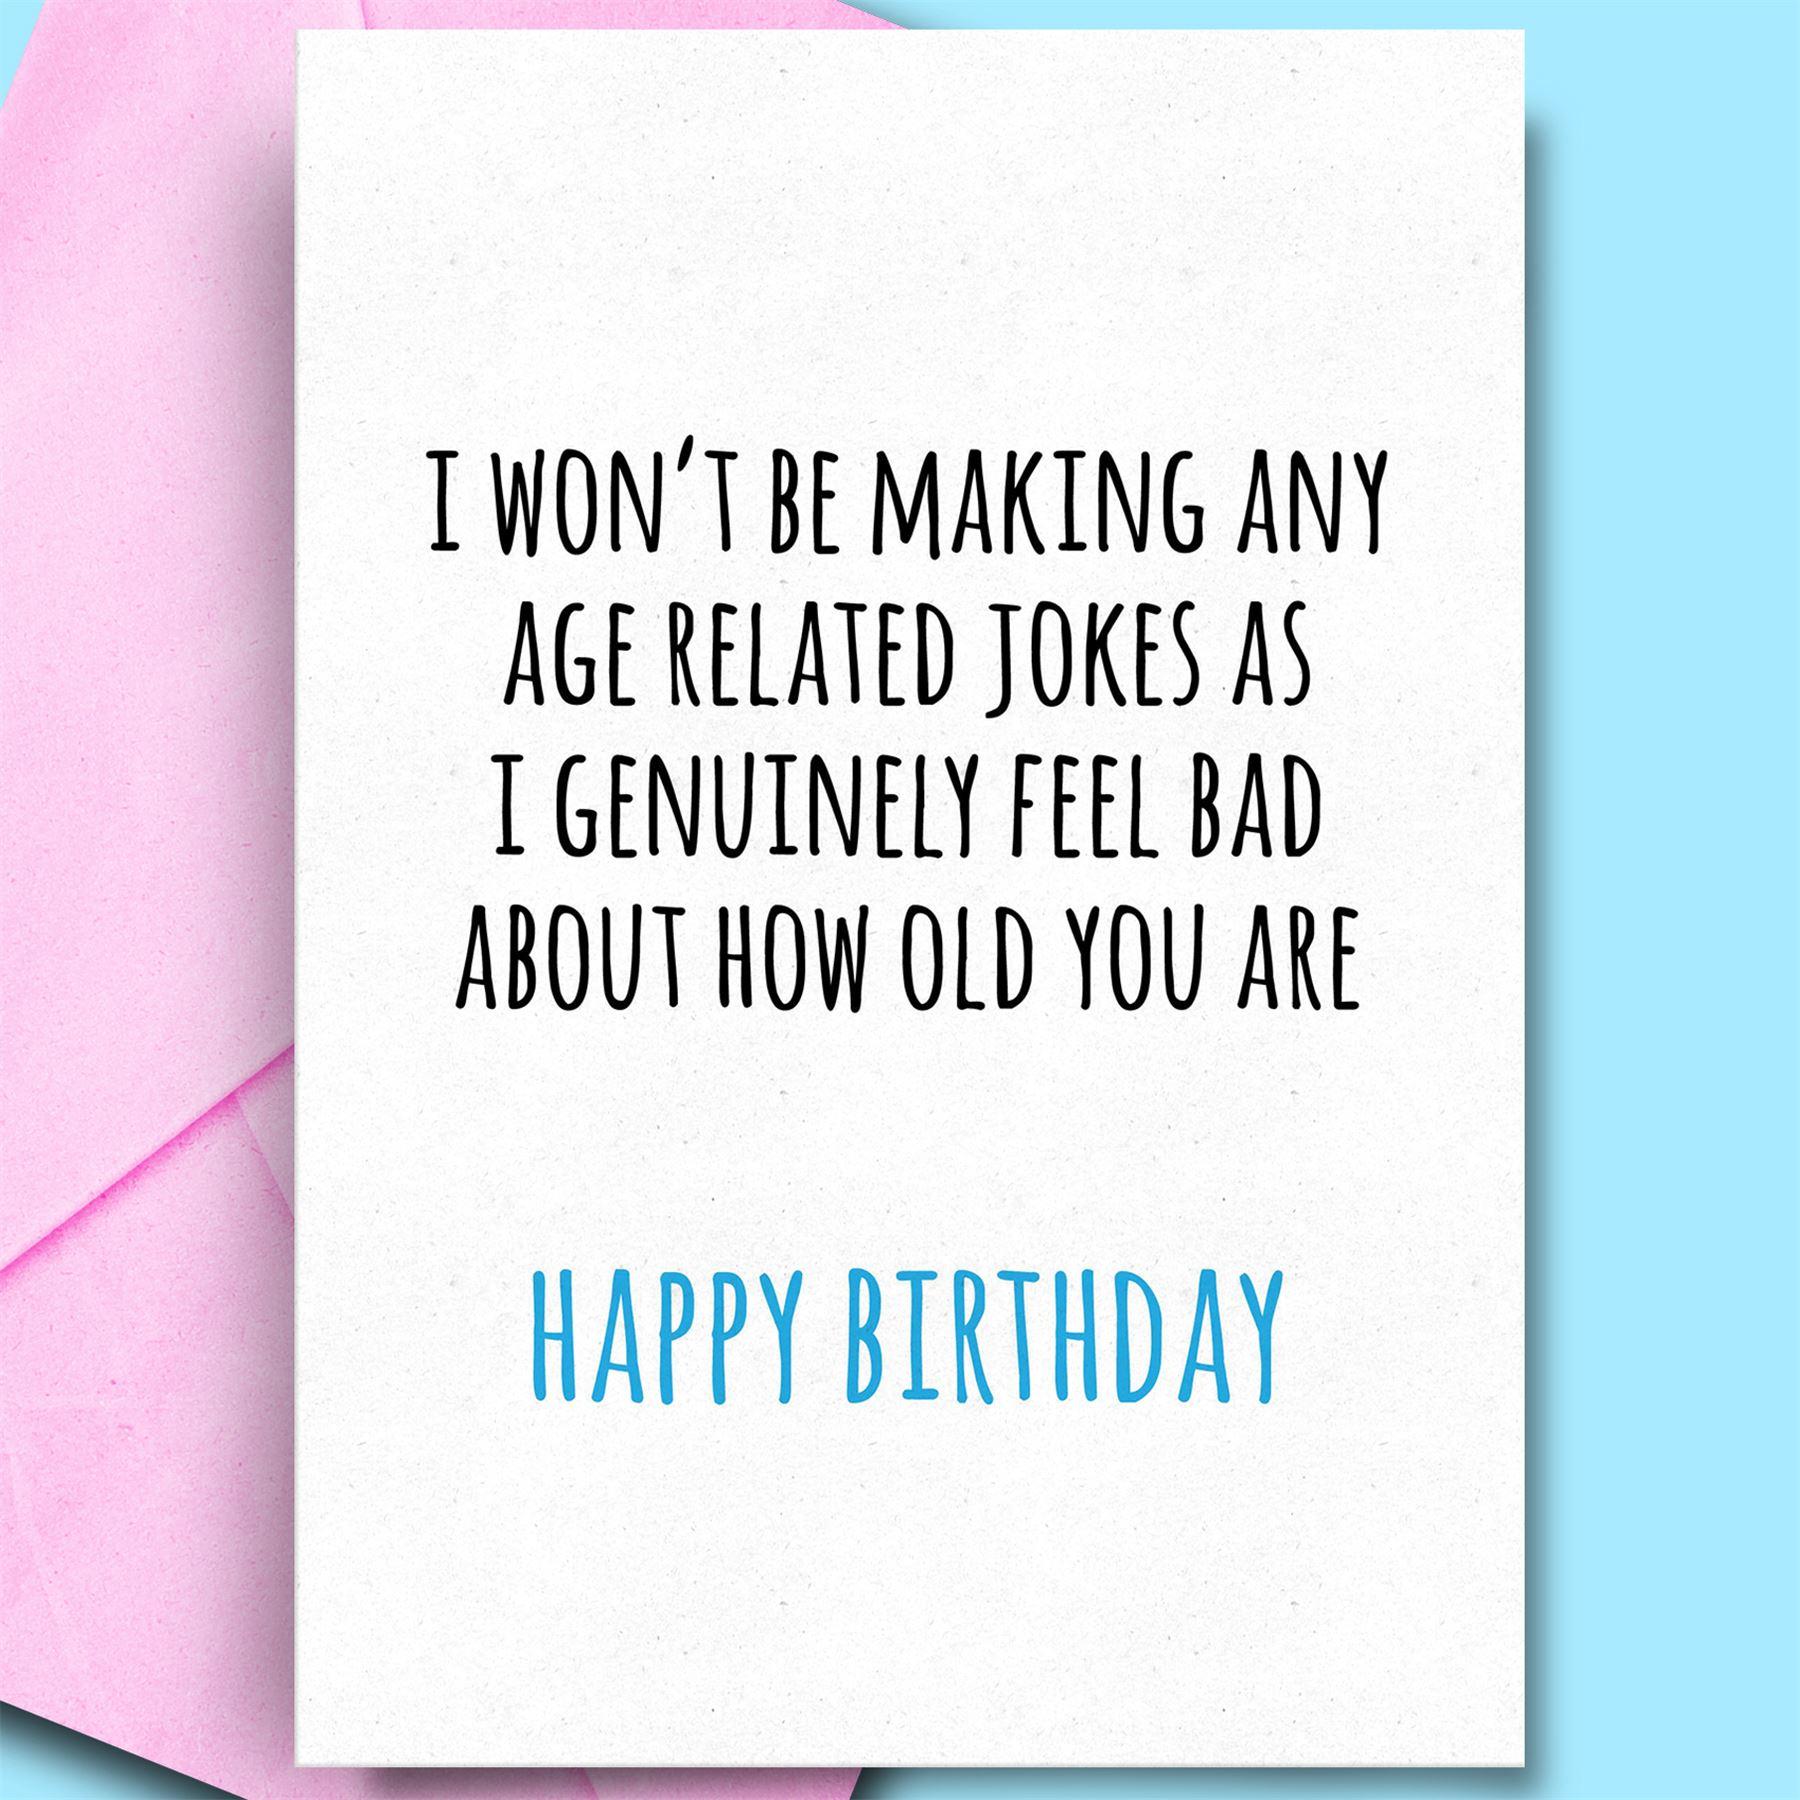 Funny Happy Birthday Cards For Son Husband Aunt Friend Comedy Adult Rude Fun Ebay